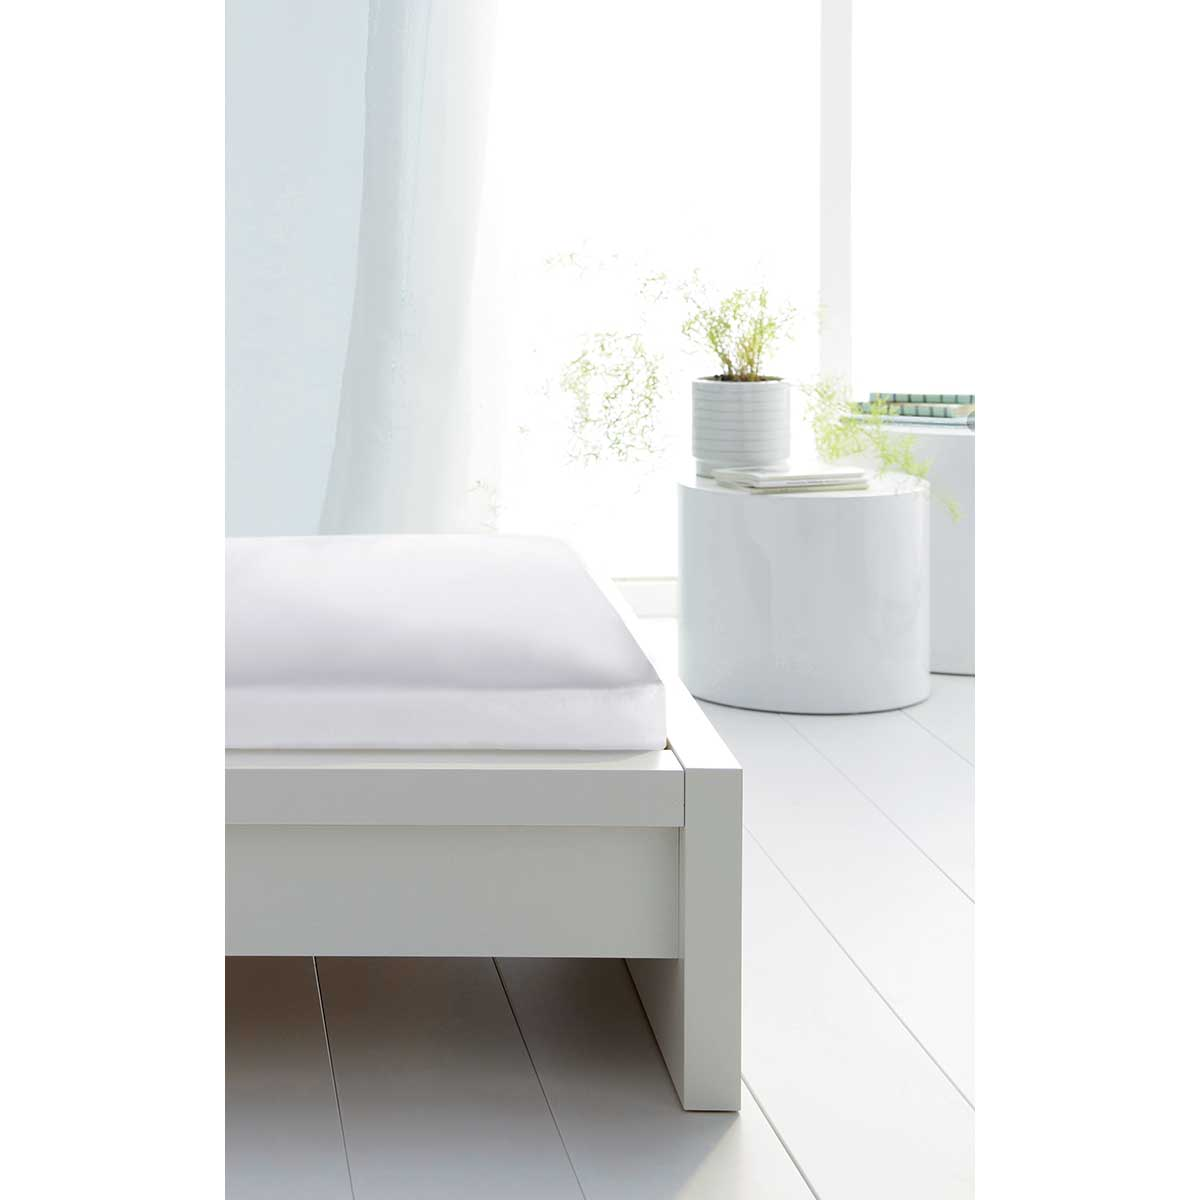 Protection de lit en molleton (Blanc)